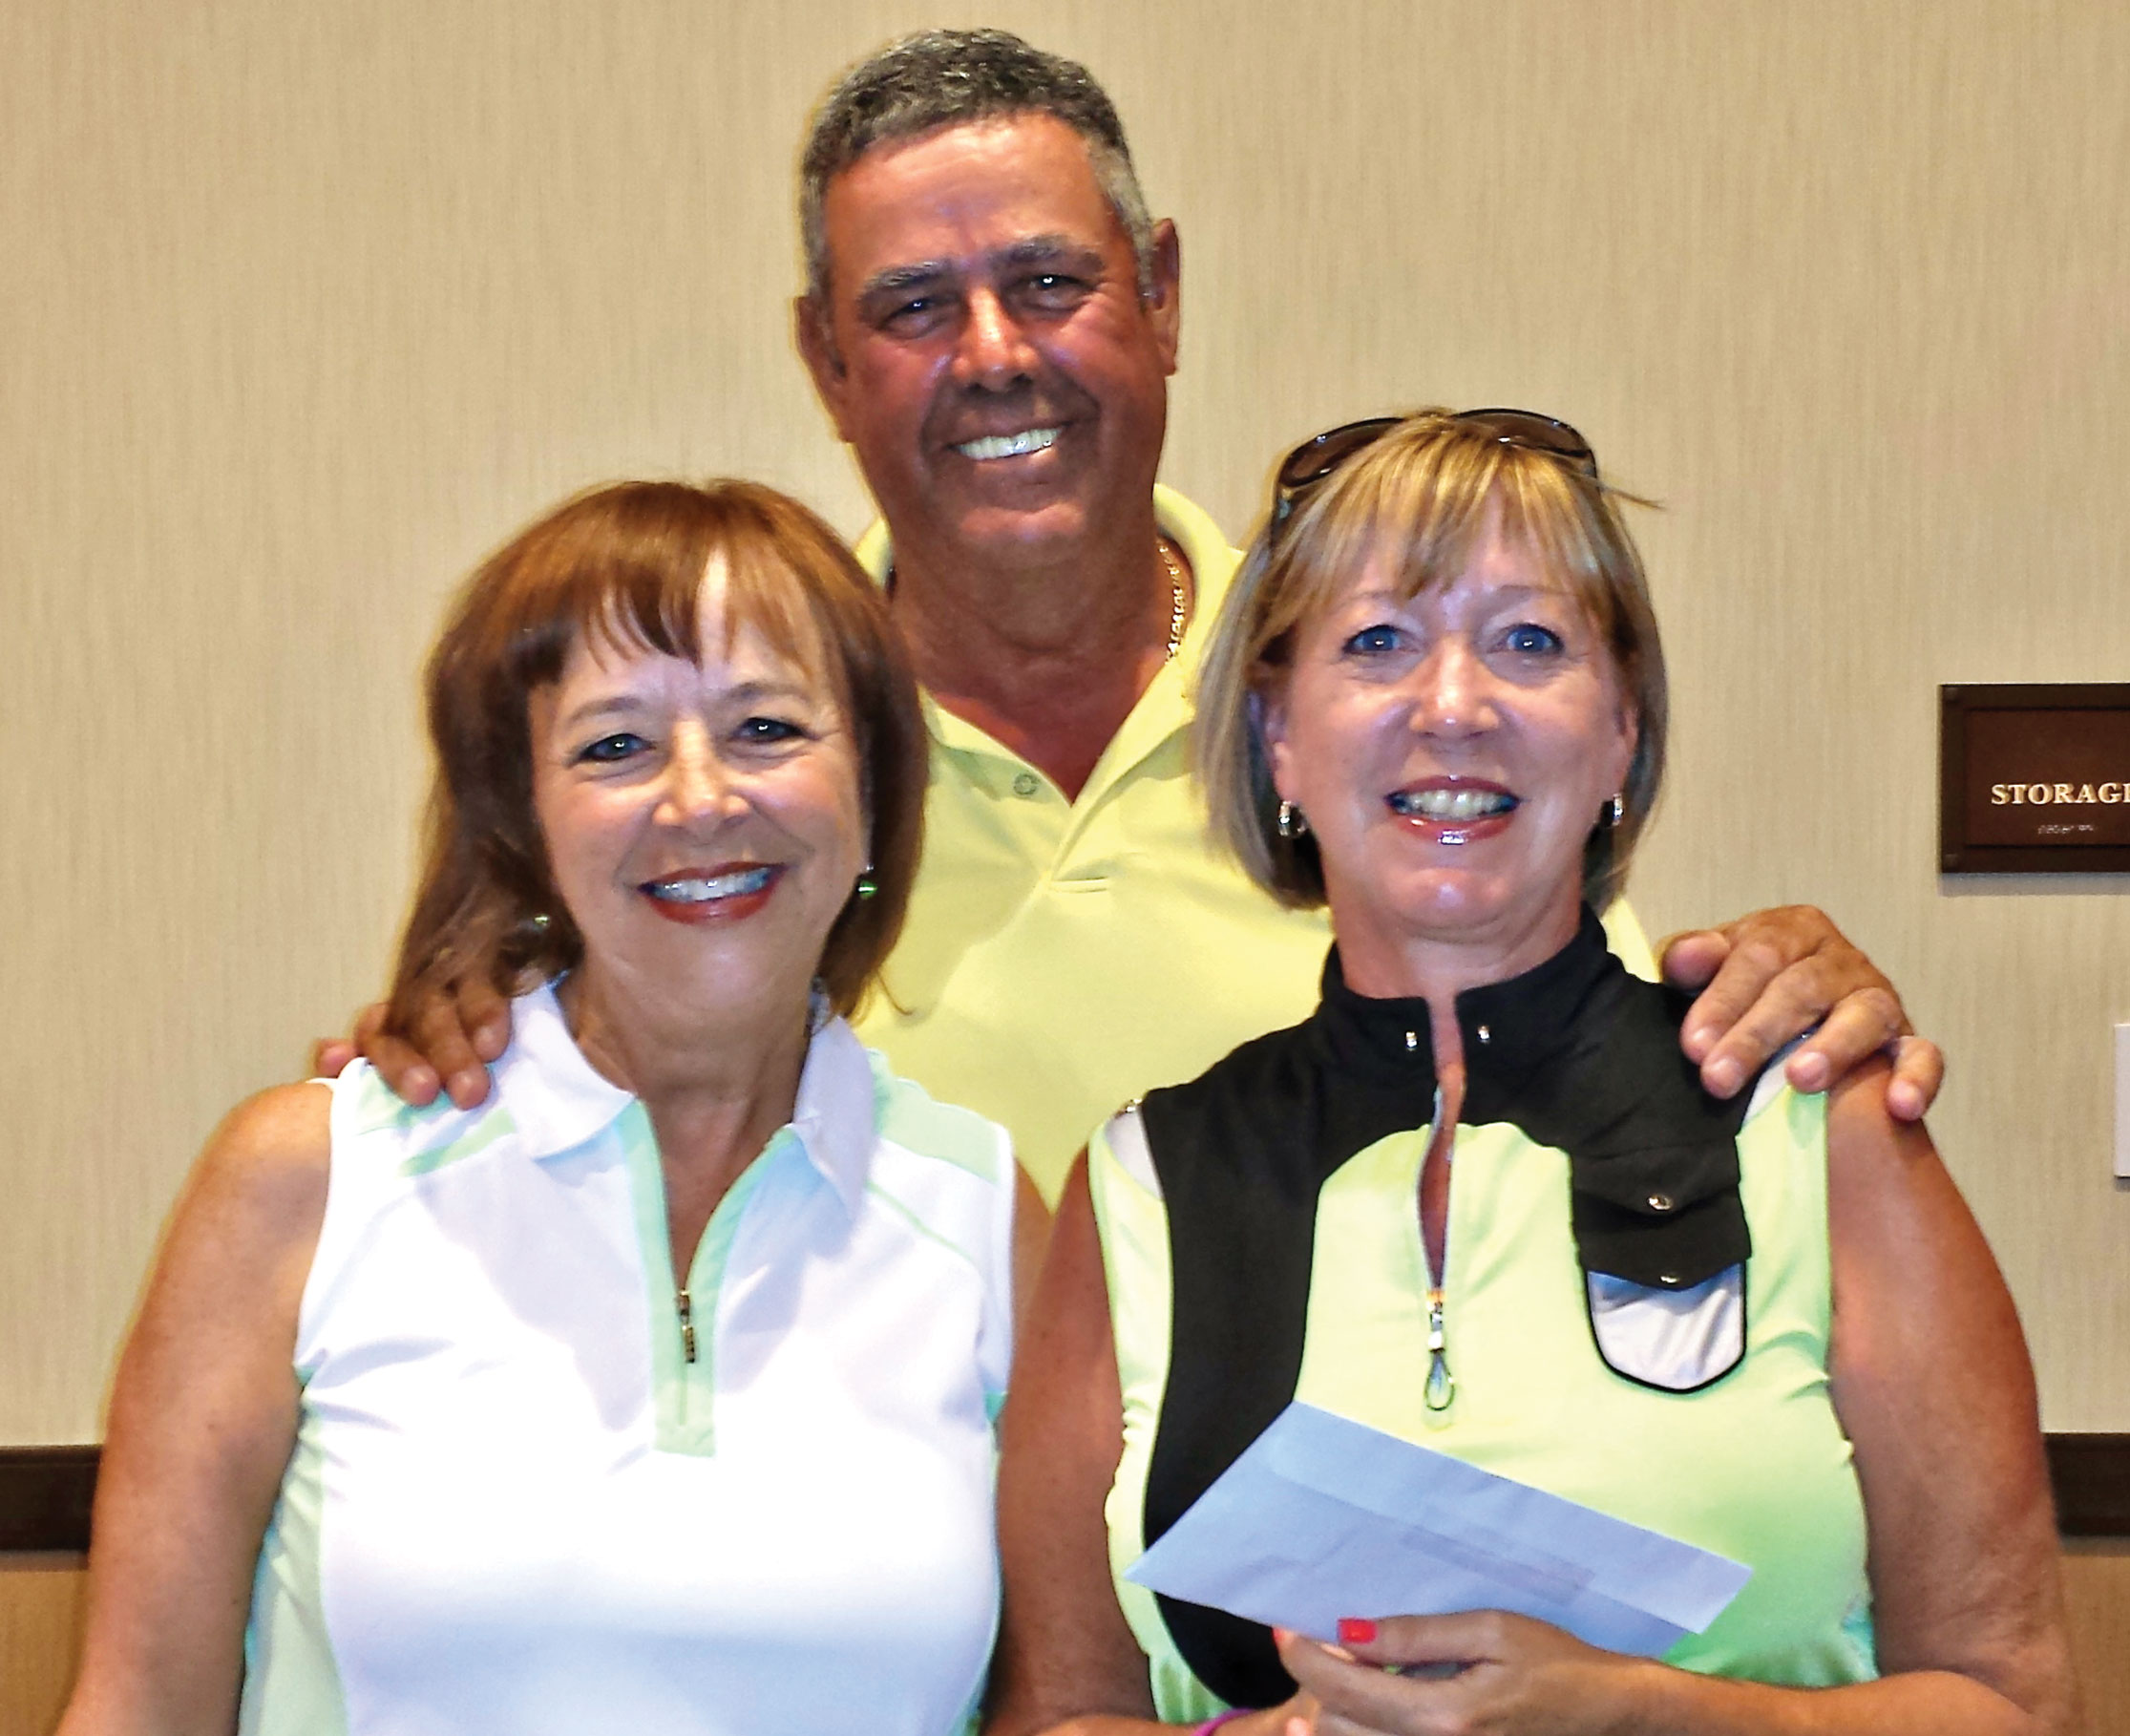 Flight two, first place: Jan Stocek, Jim Osborne and Barbara Gayer, owner